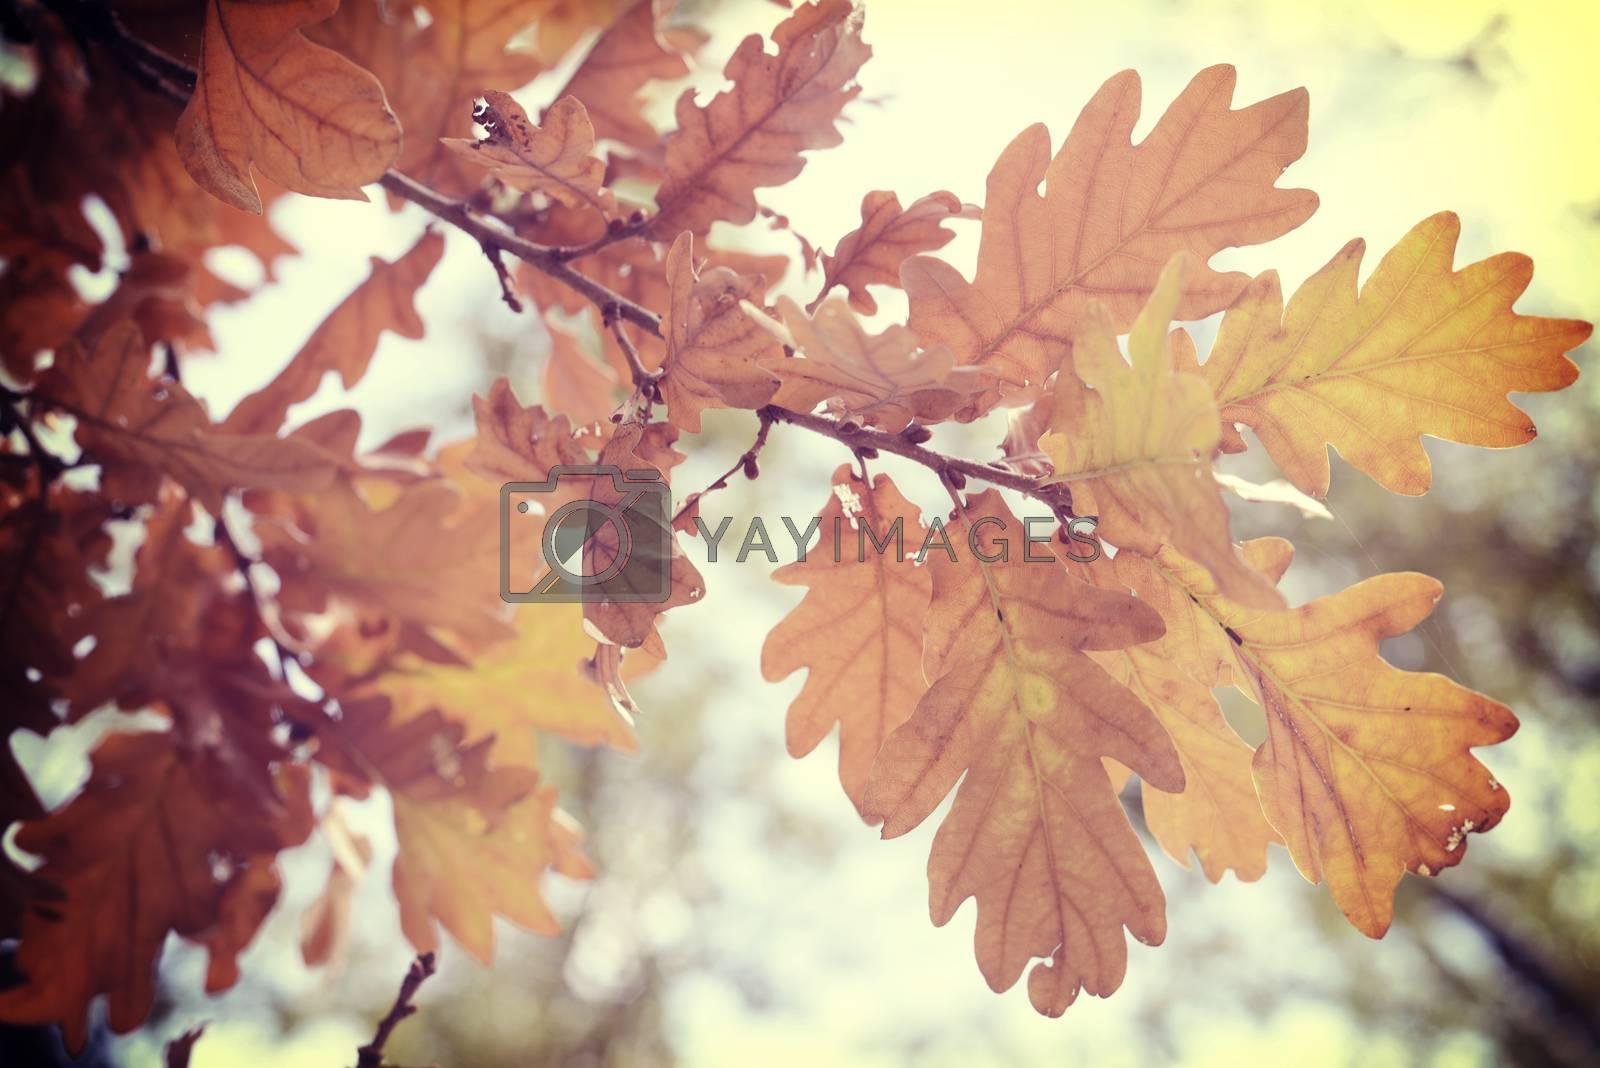 Fall season oak autumn tree foliage branch in warm sun light background with vintage filter.